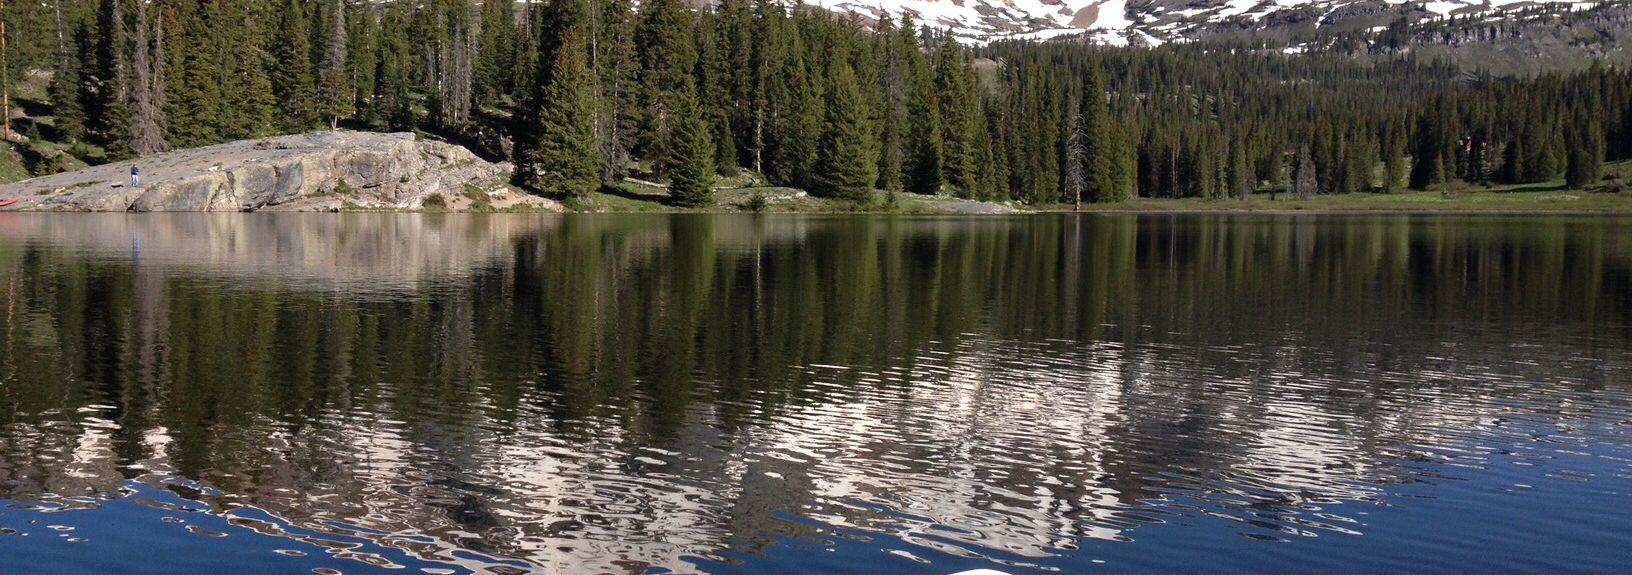 Almont, Colorado, United States of America